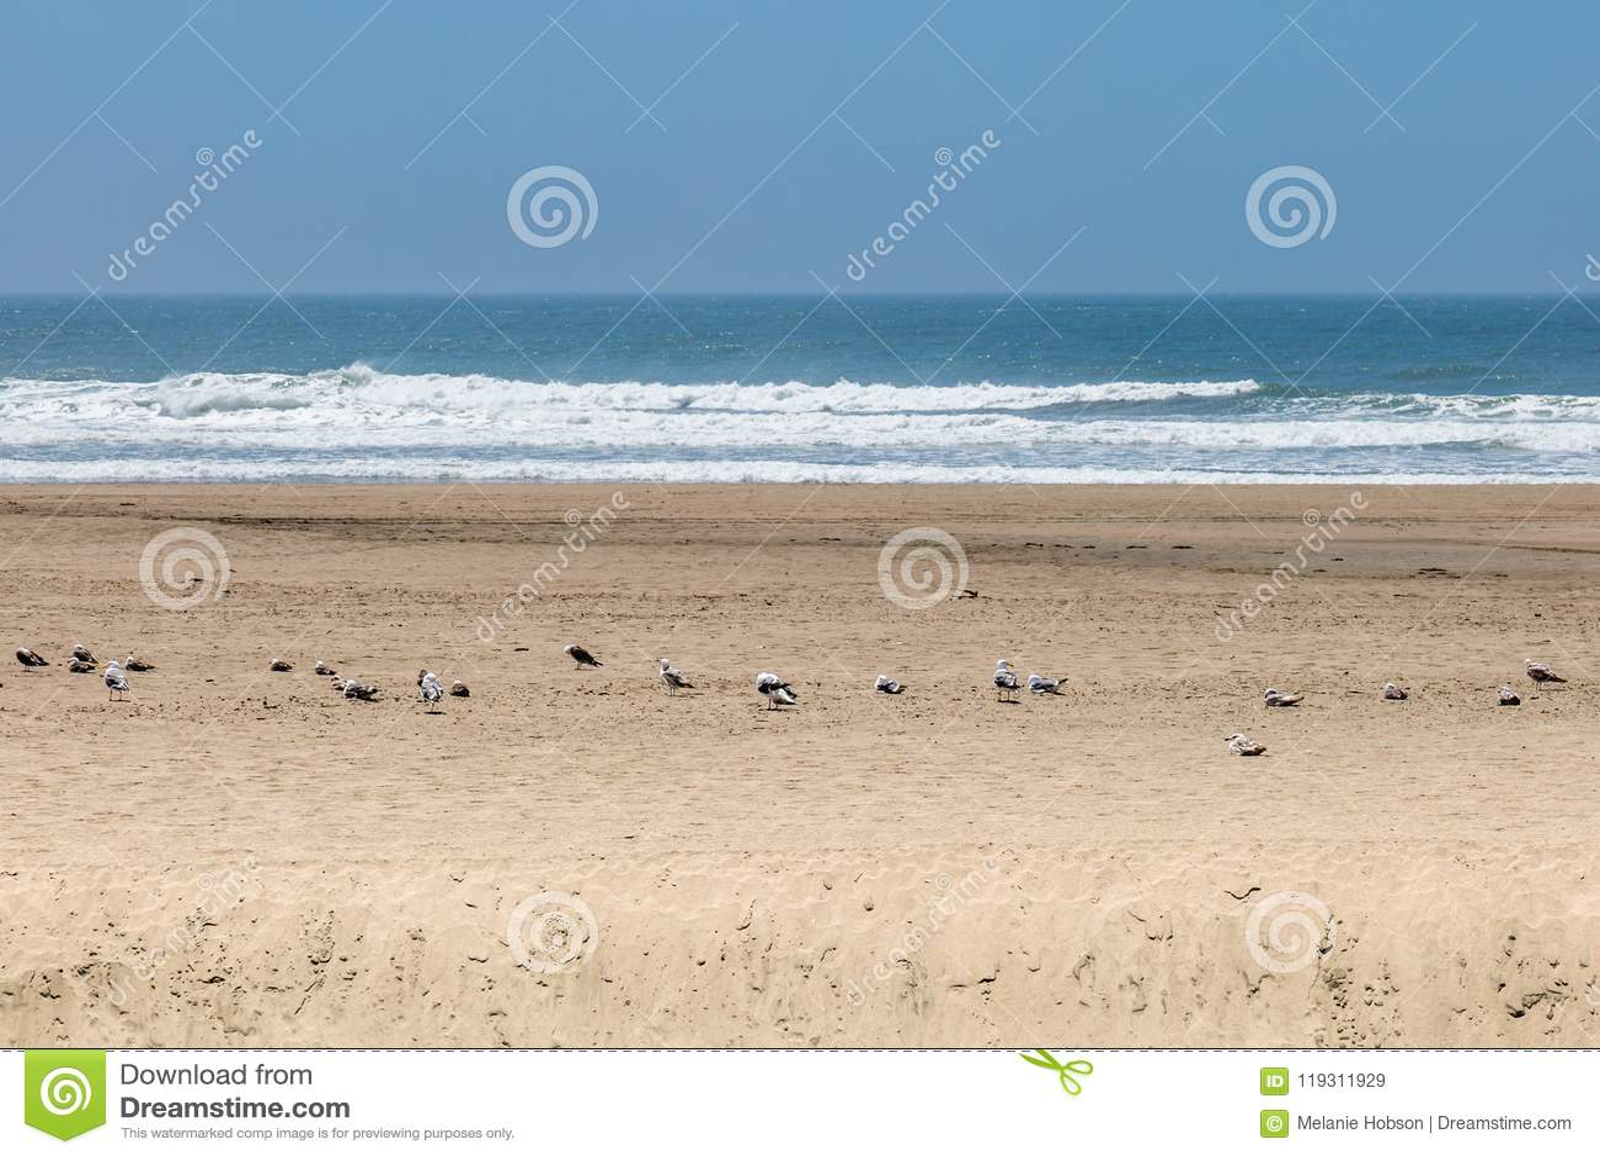 Seagulls On The Sand At Ocean Beach San Francisco Stock Image